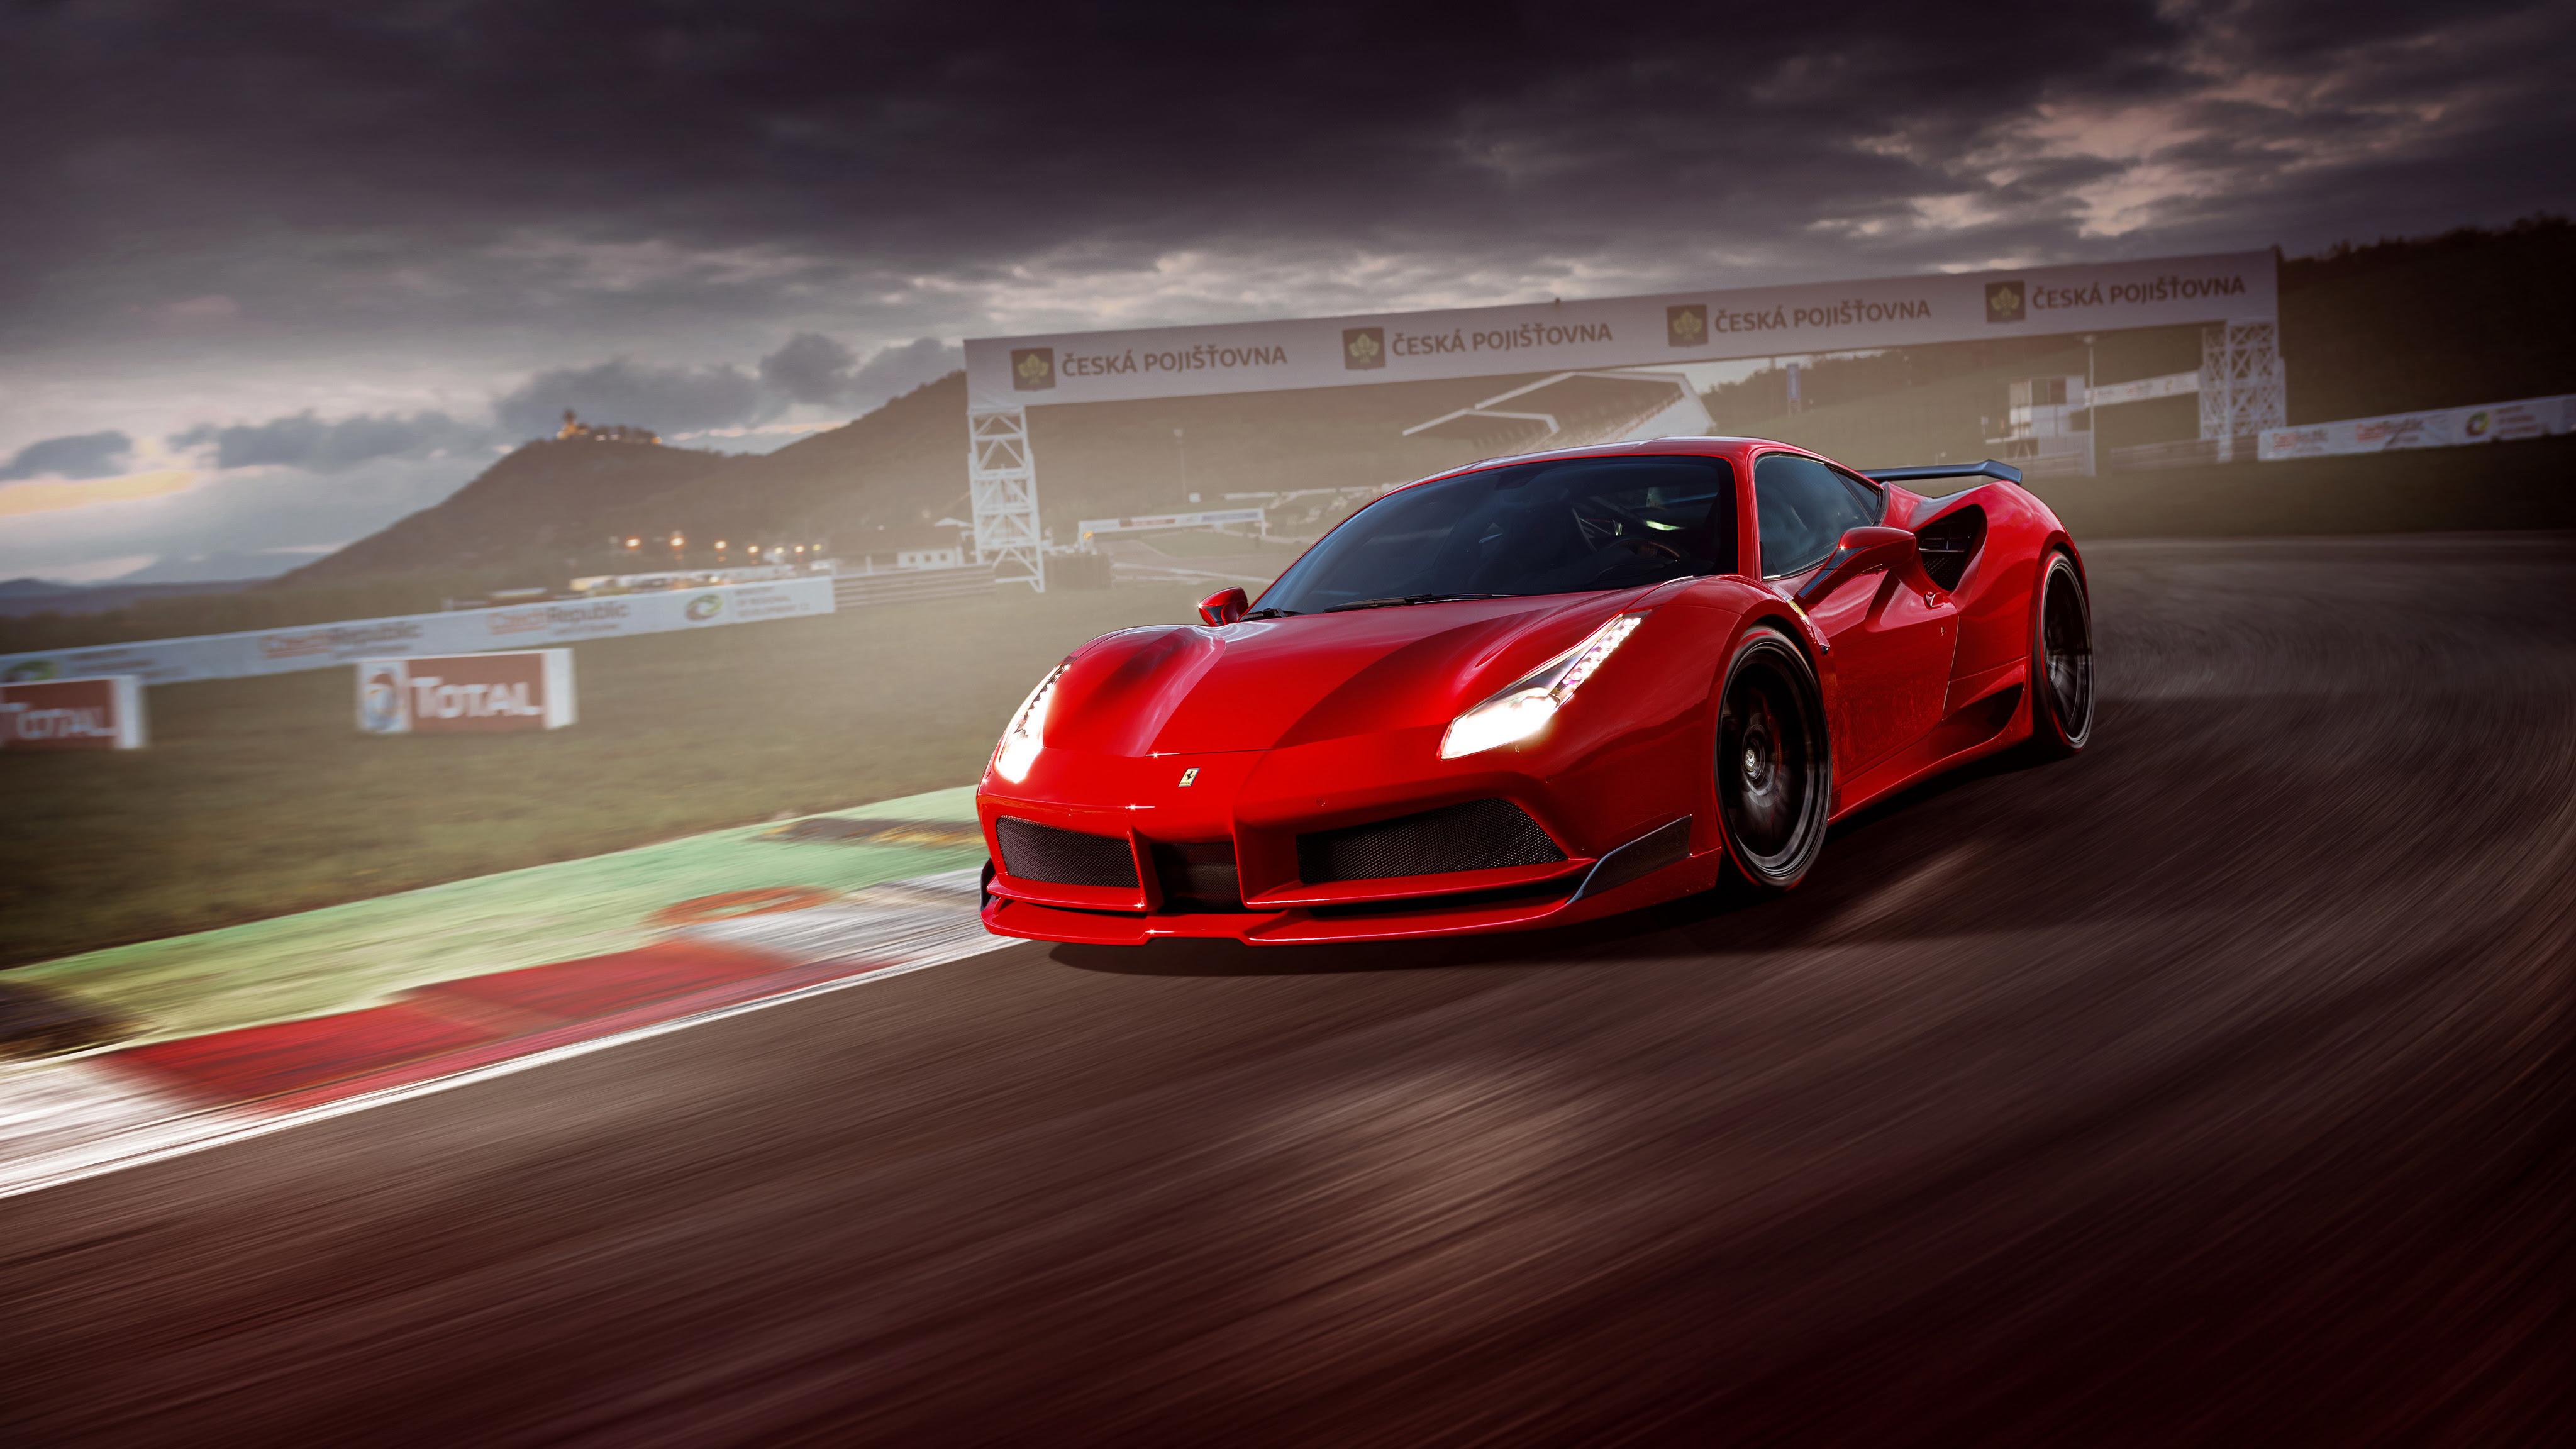 100 Ideas Hd Images Of Ferrari On Www Awesoome Com